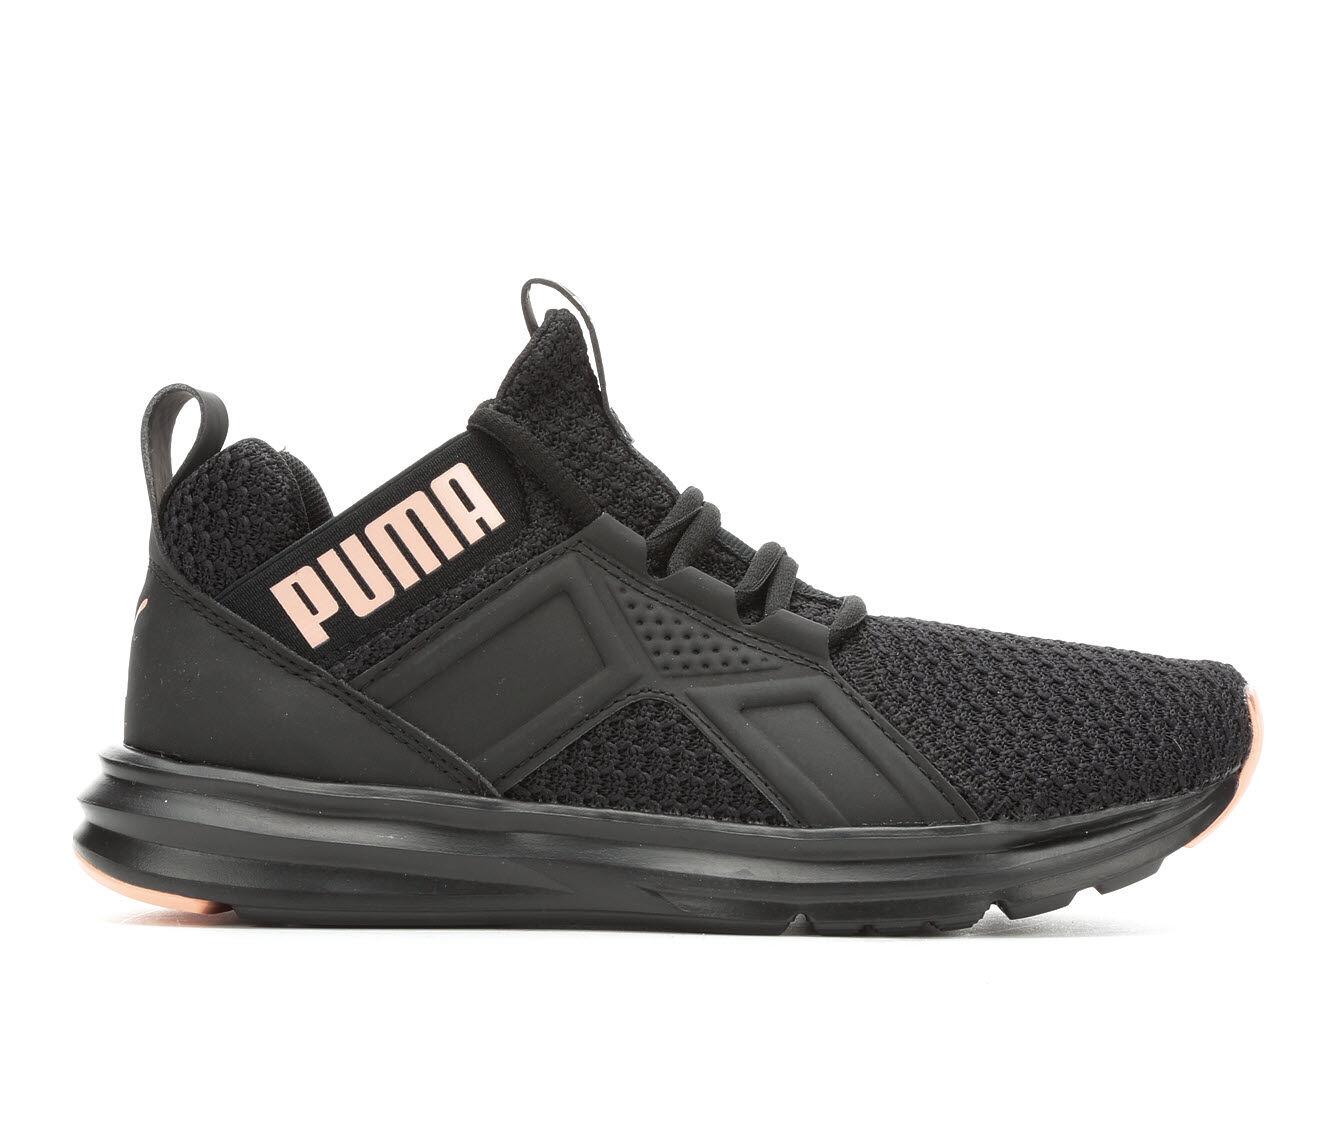 Women's Puma Enzo Knit NM Sneakers Black/Peach